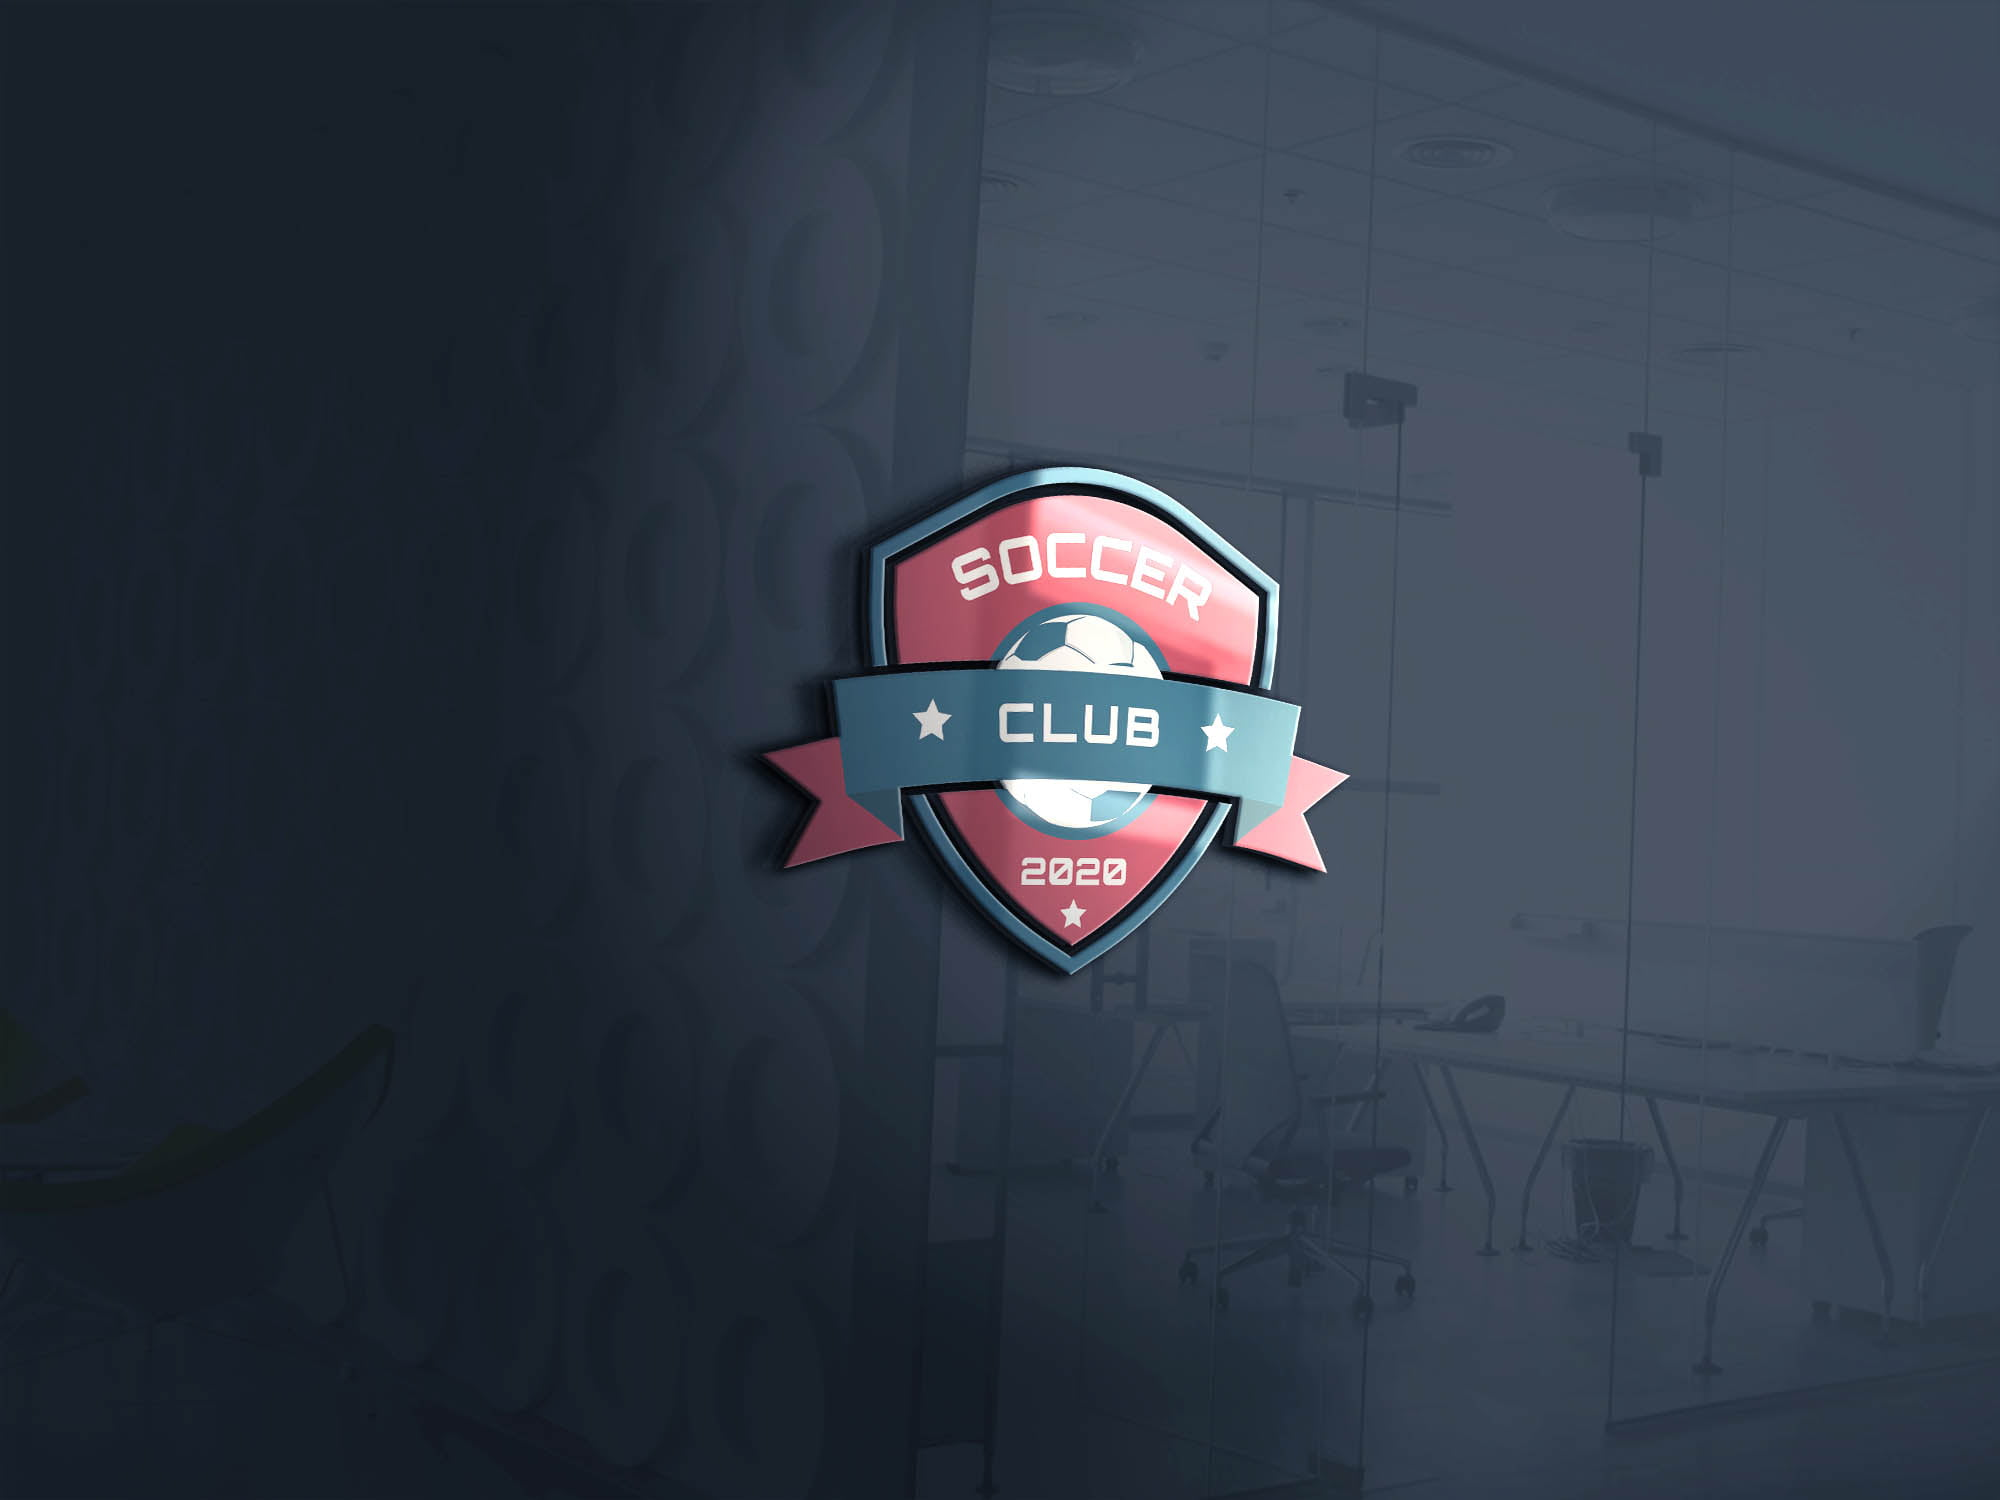 3D SOCCER CLUB LOGO